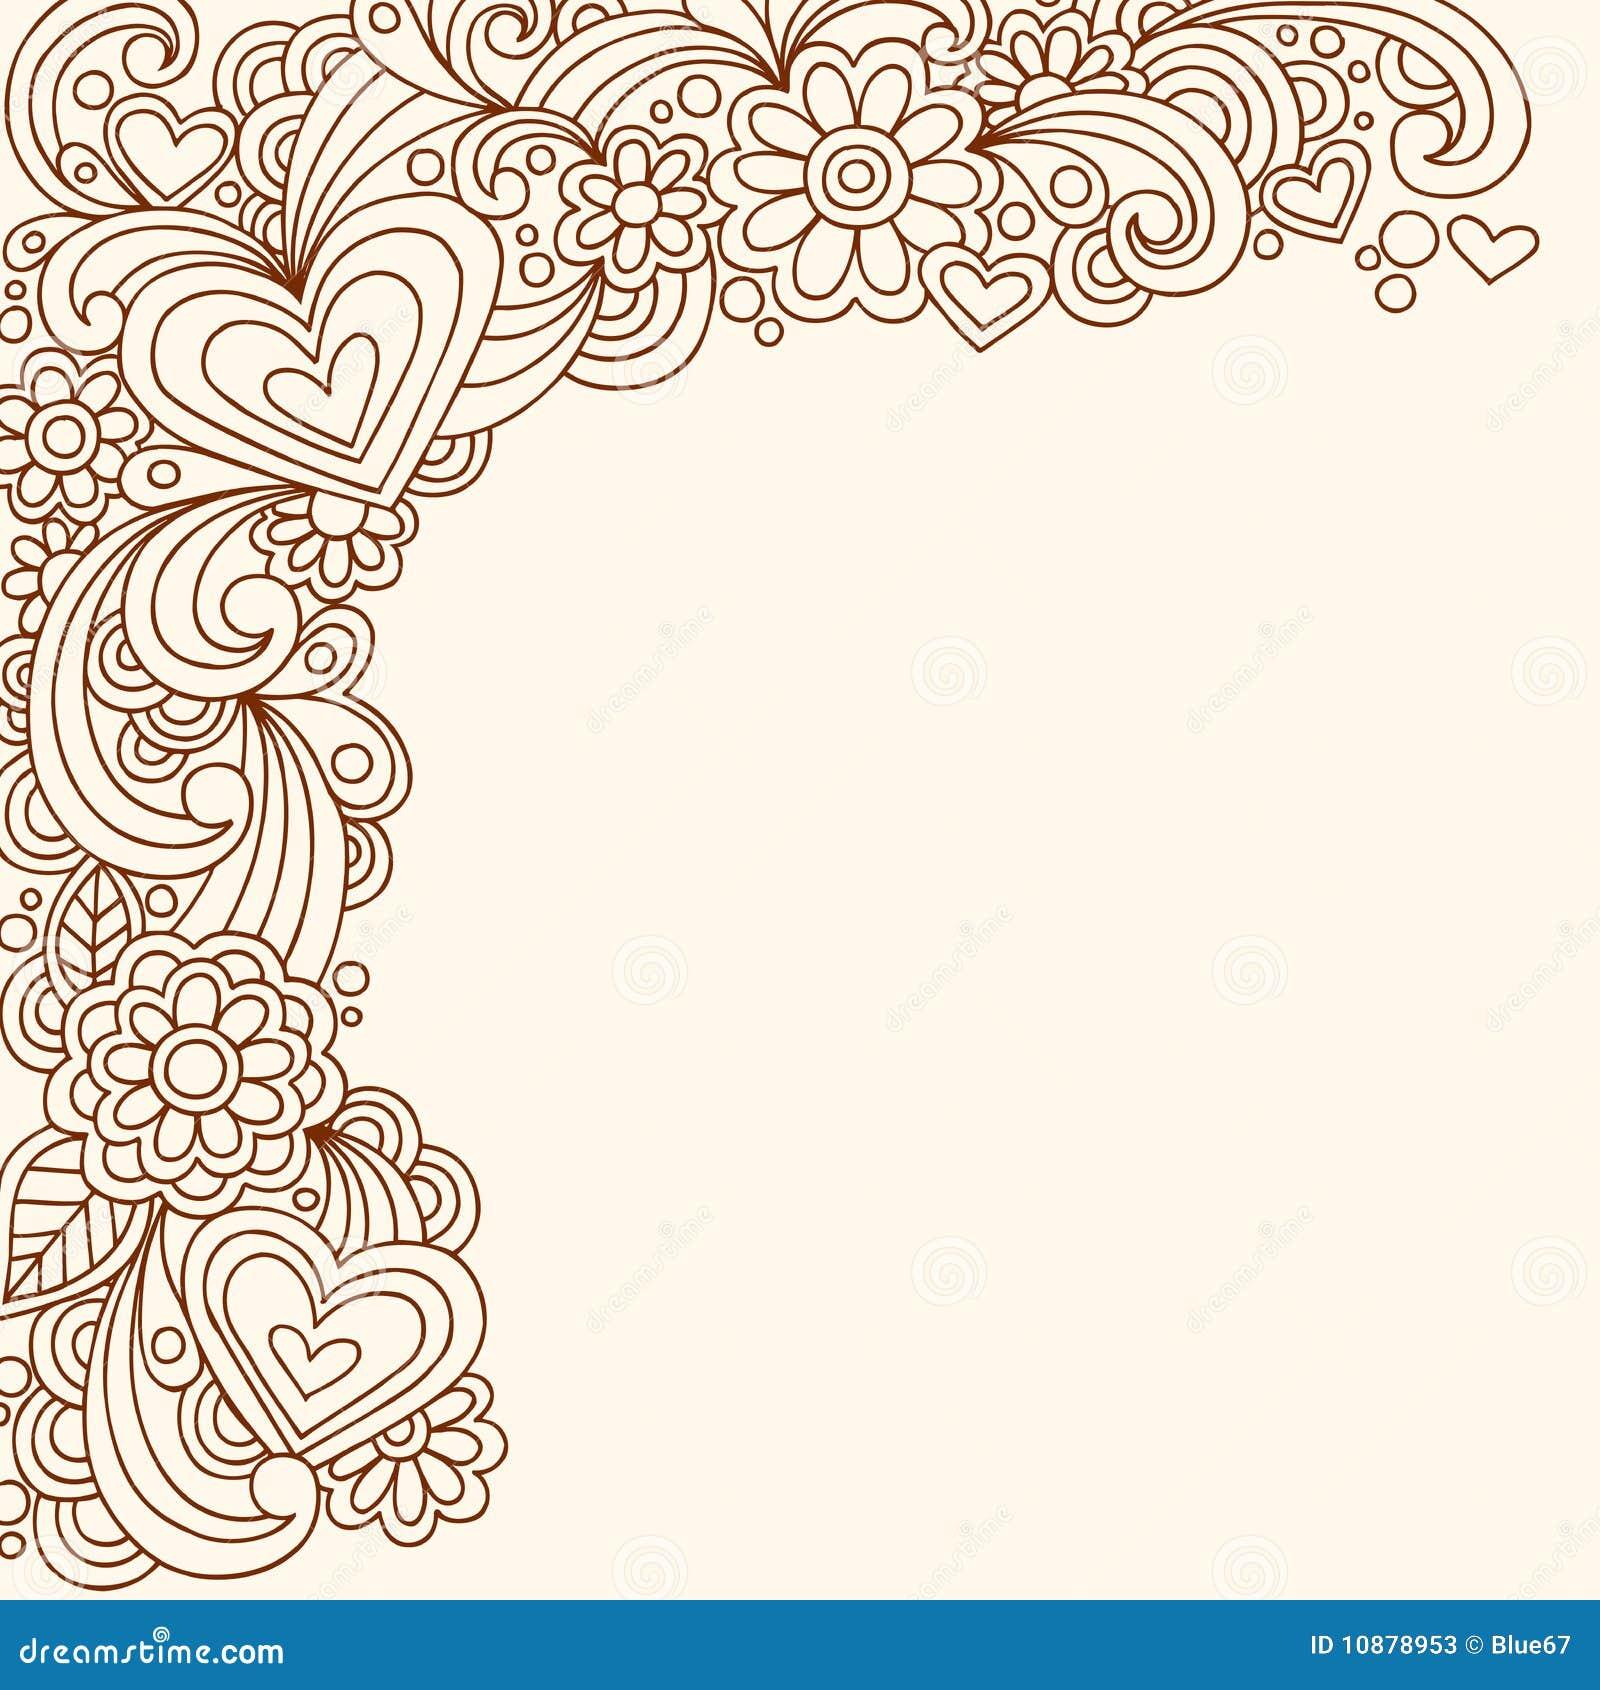 Henna Doodle αφηρημένο διάνυσμα σχεδίου